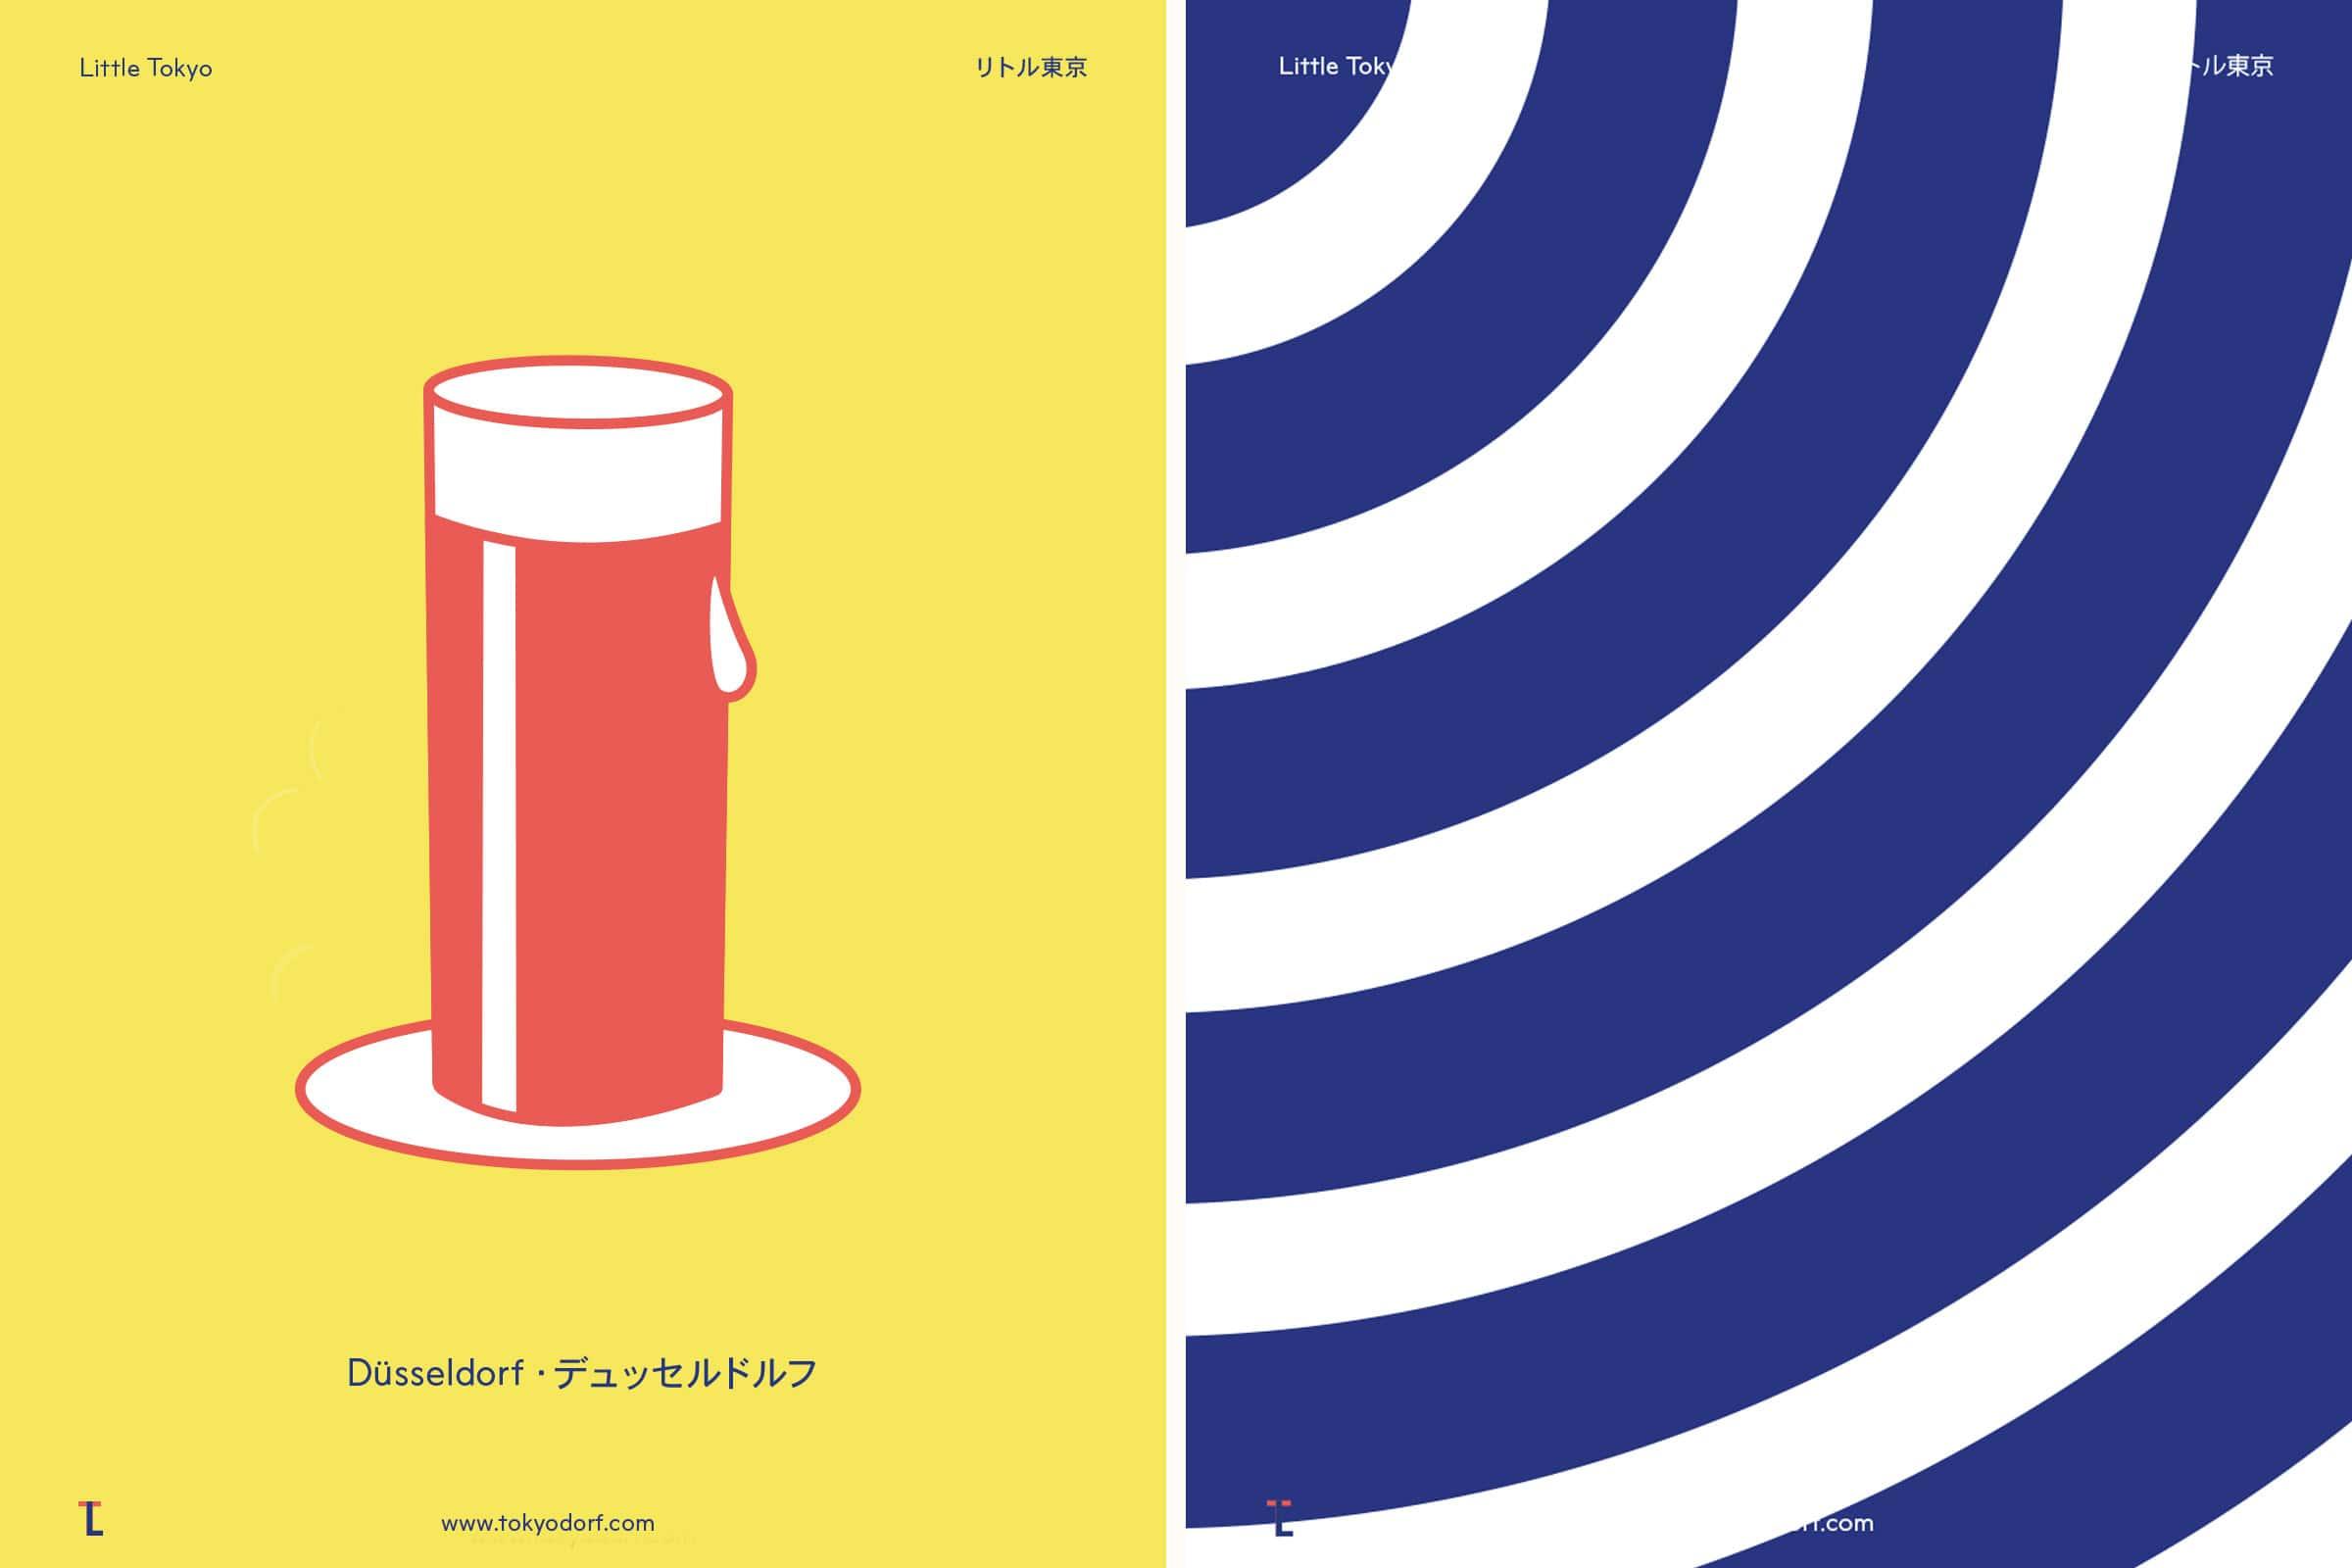 Alt Bier, Little Tokyo, Muster